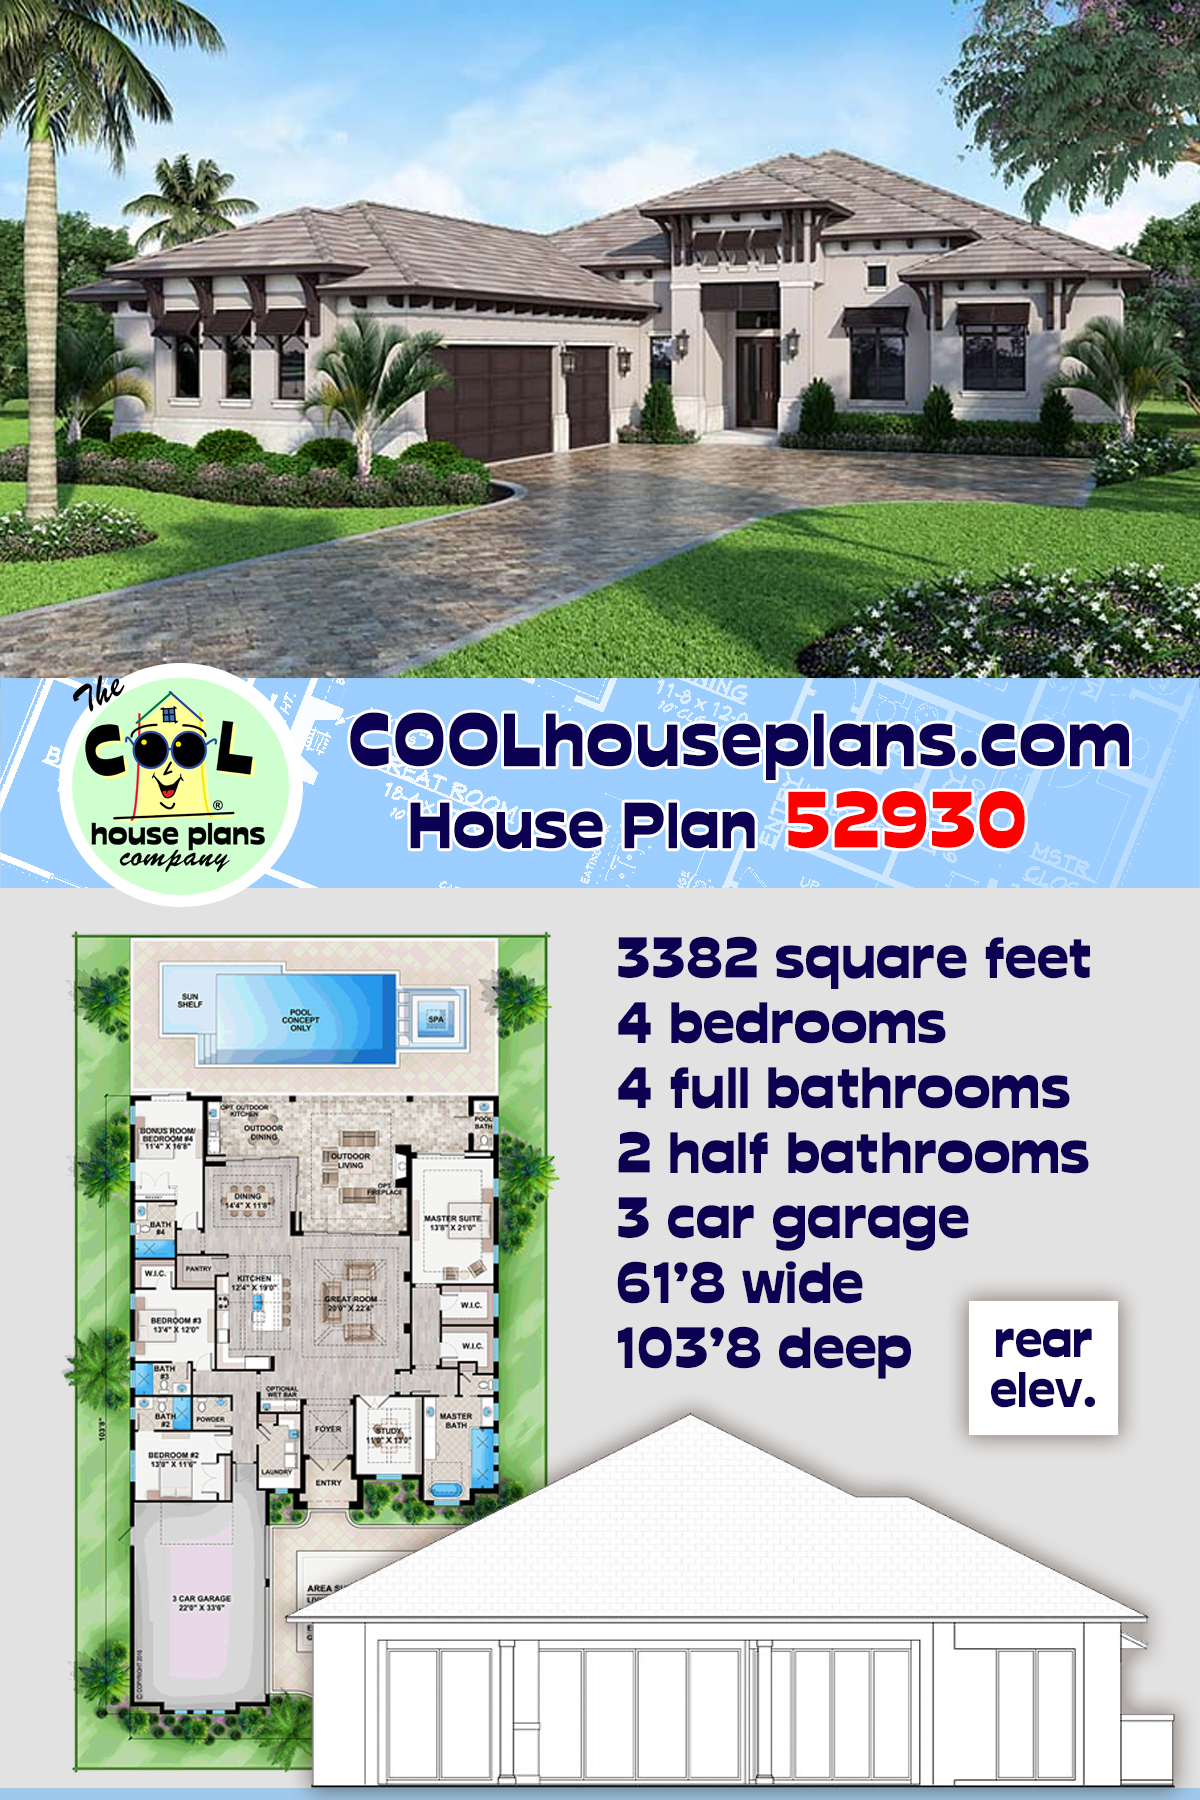 Coastal, Florida, Mediterranean House Plan 52930 with 4 Beds, 6 Baths, 3 Car Garage